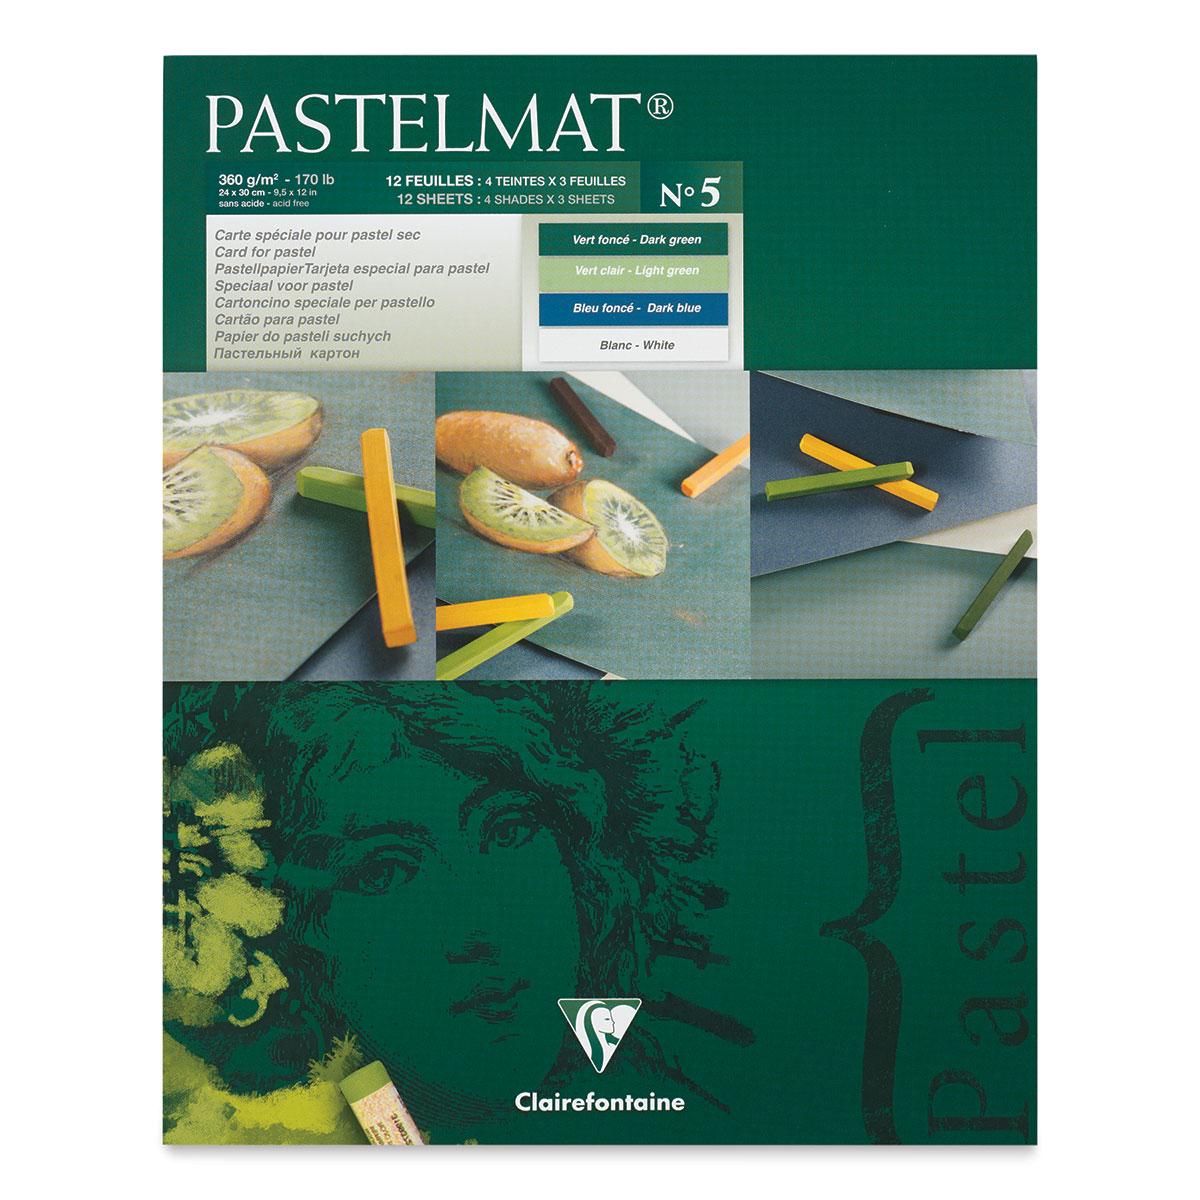 Clairefontaine Pastelmat Pastel Card Pad No 2 12 Sheets,... 360 g 24 x 30 cm